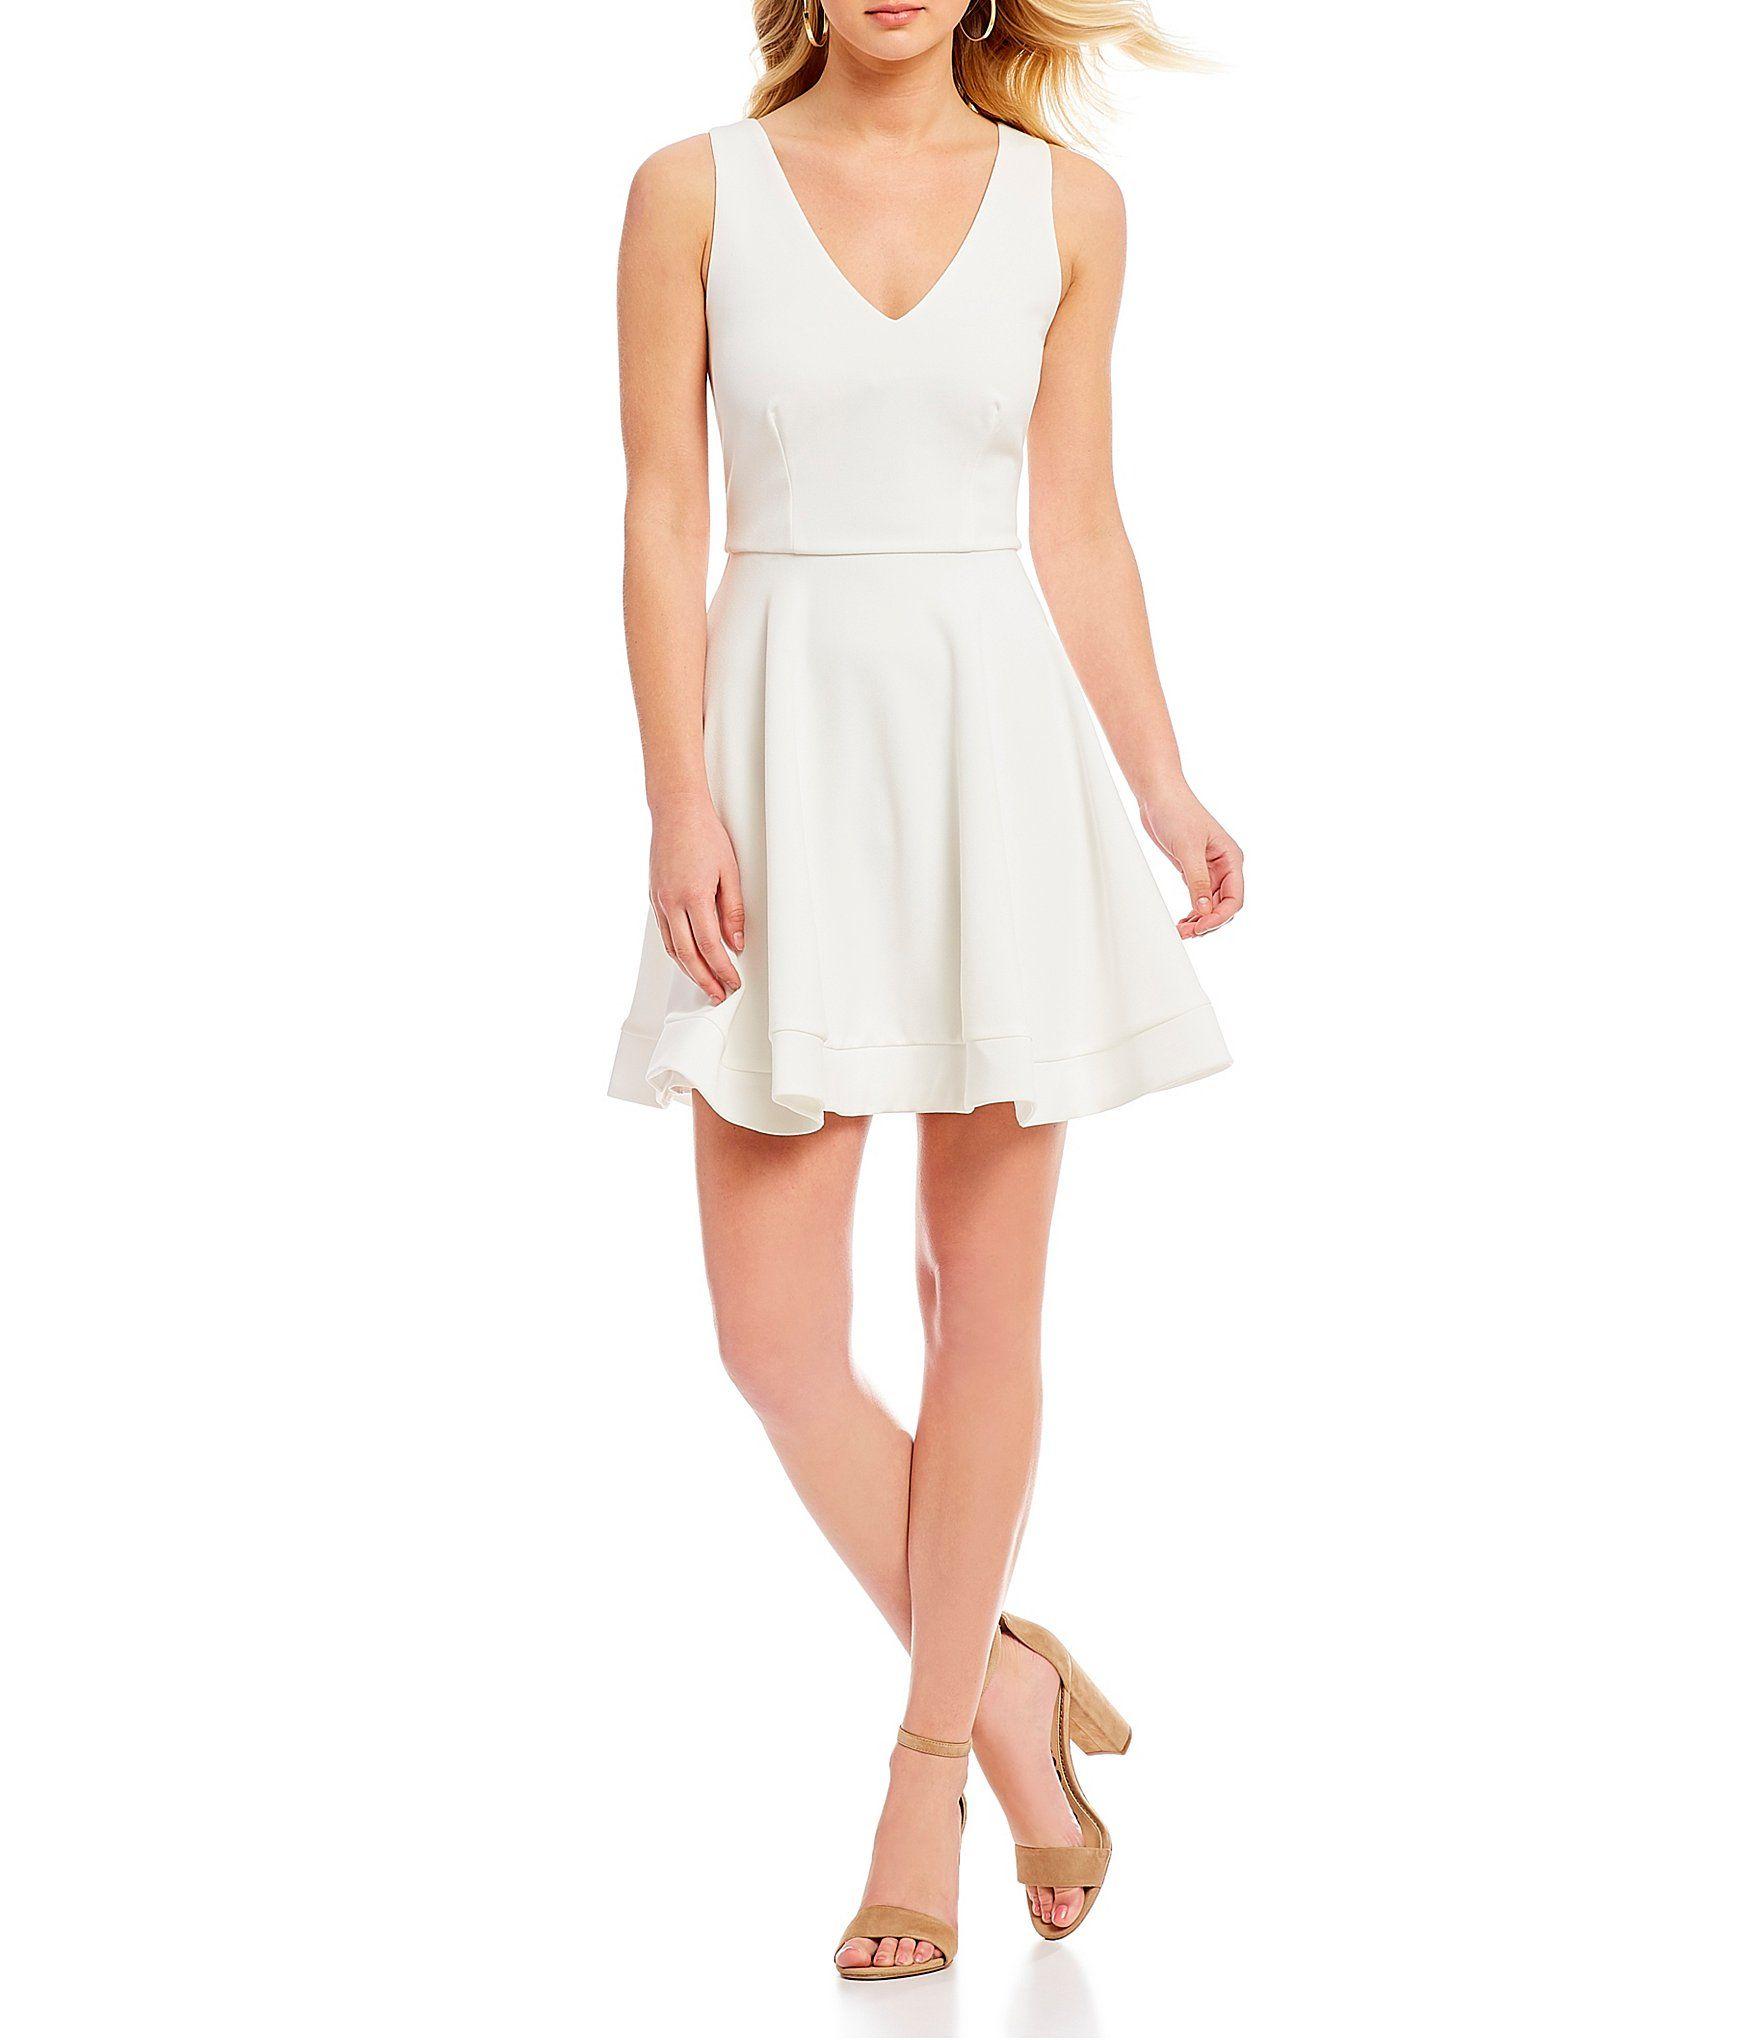 B darlin sleeveless vneck bowback fitandflare dress style